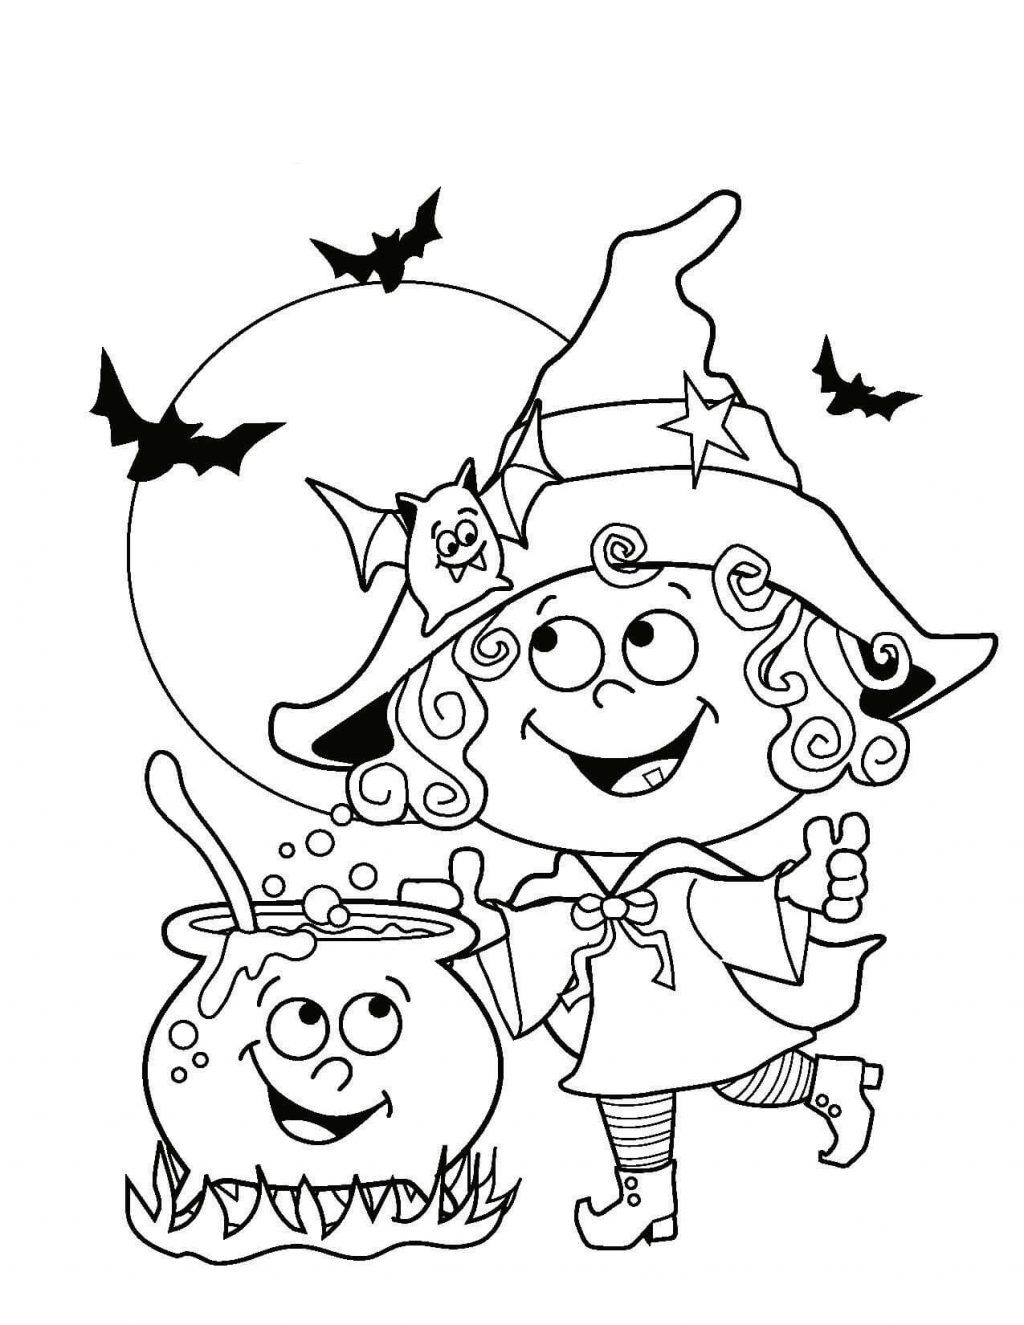 Crayola Halloween Coloring Pages Sheets Free Holidays Printable Bingo Page Templates Cute Printables Giraffe Elij Halaman Mewarnai Buku Mewarnai Halloween Lucu